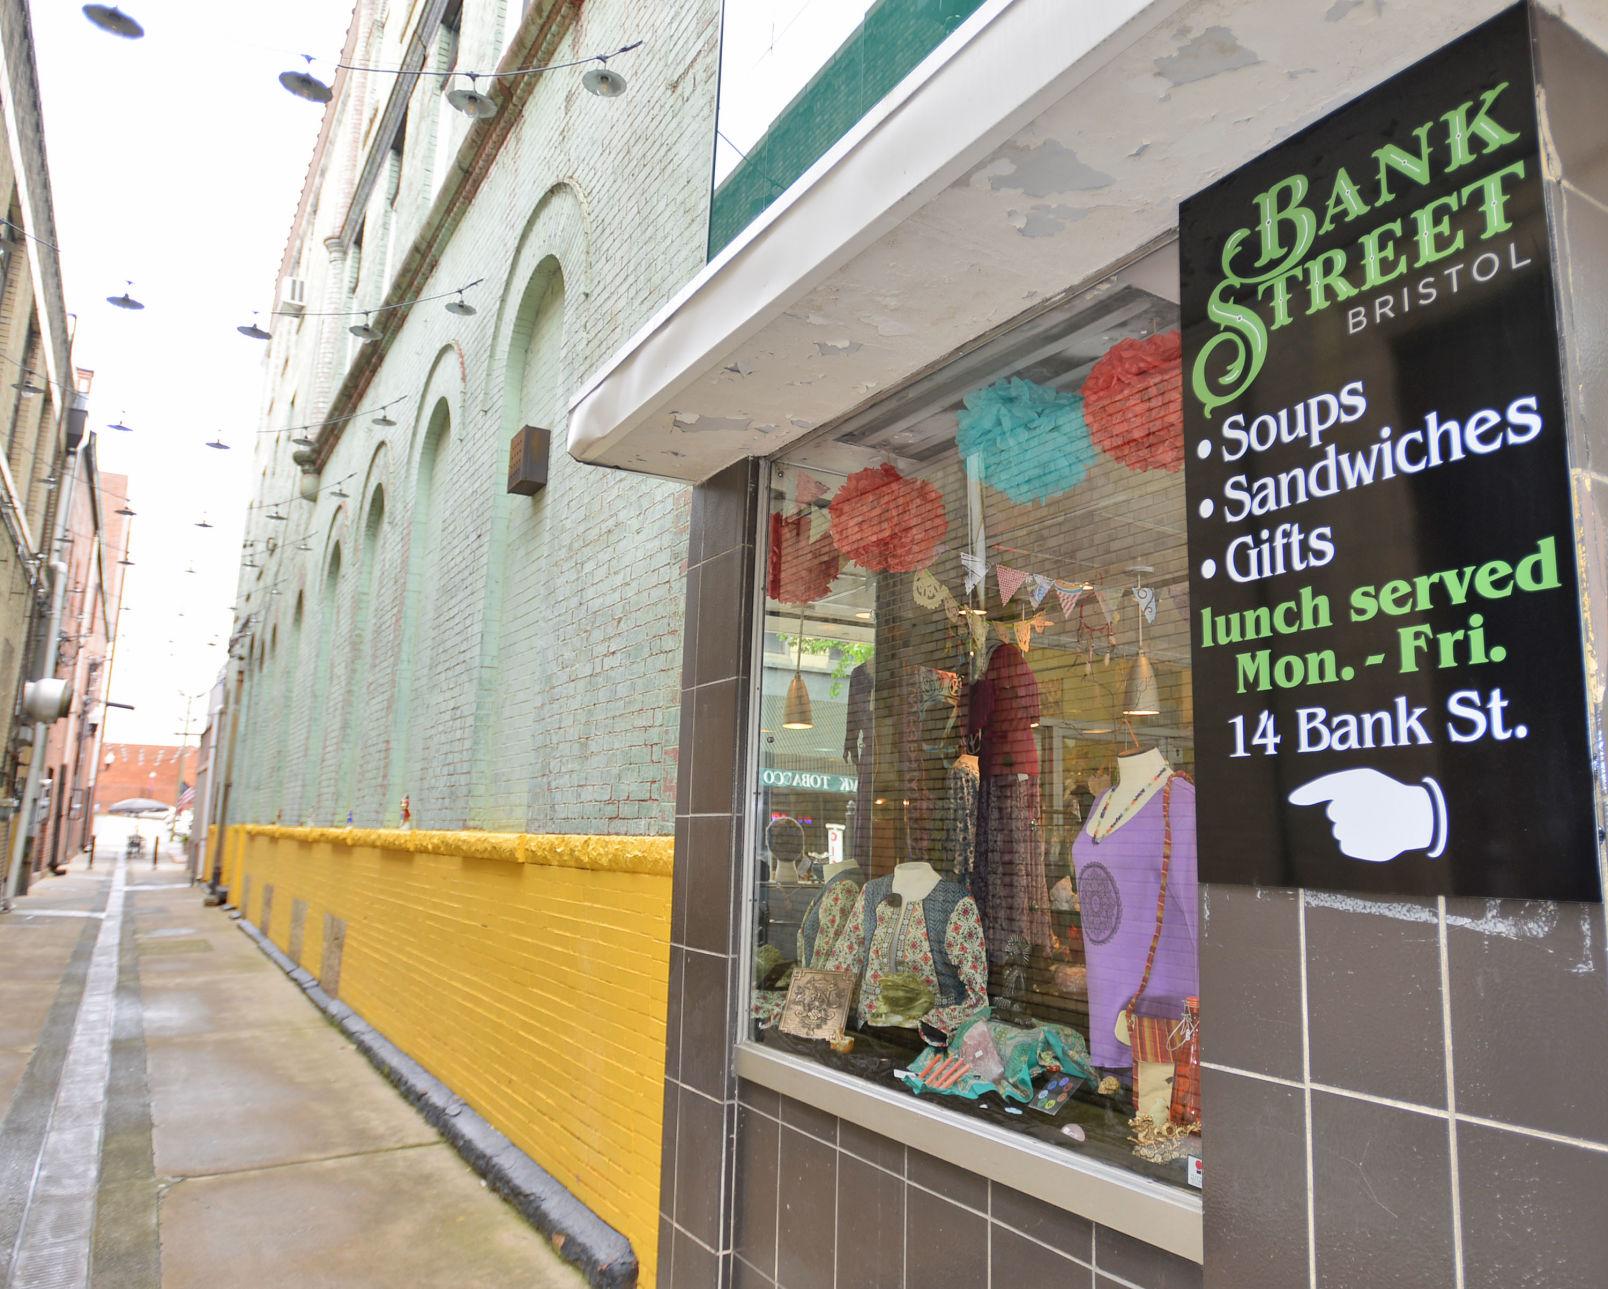 Longtime Bristol restaurant owner opens lunch counter News